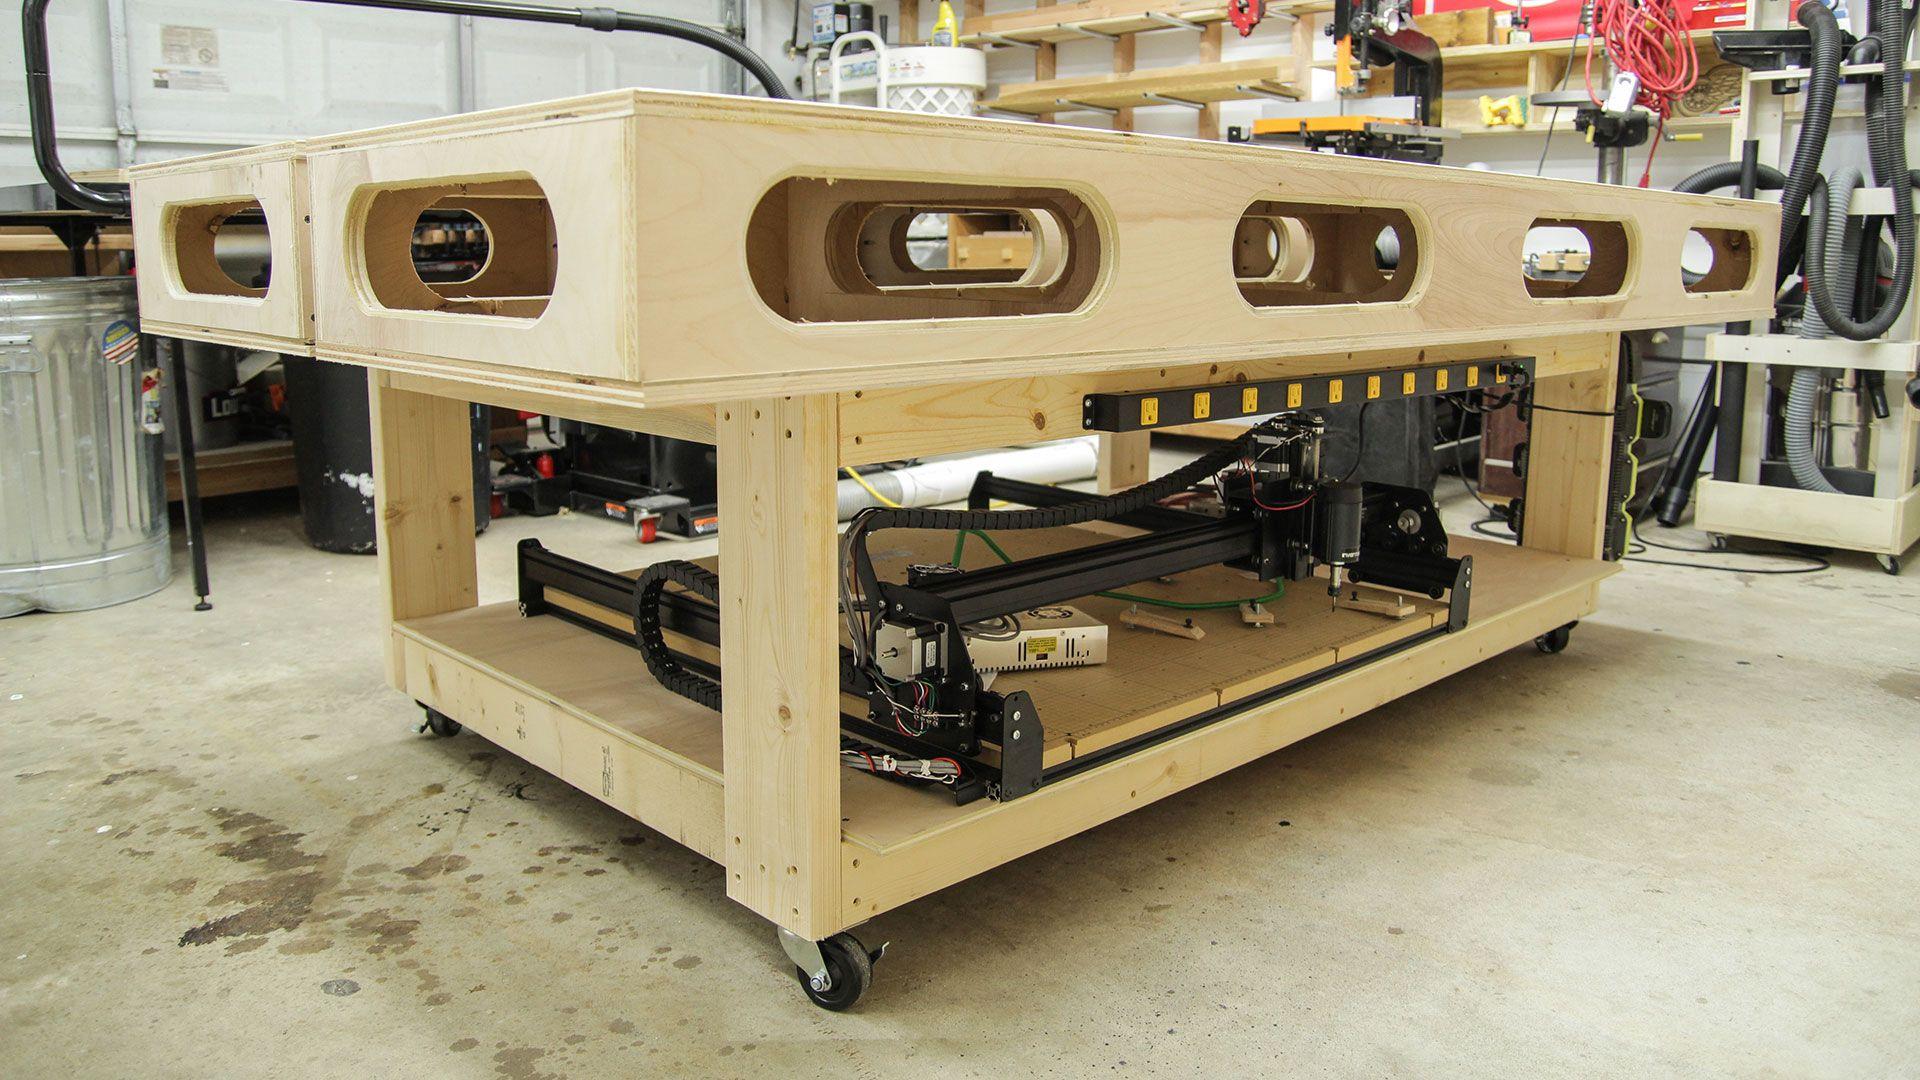 modified paulk workbench awesome wood workinghome ideas - Rolling Workbench